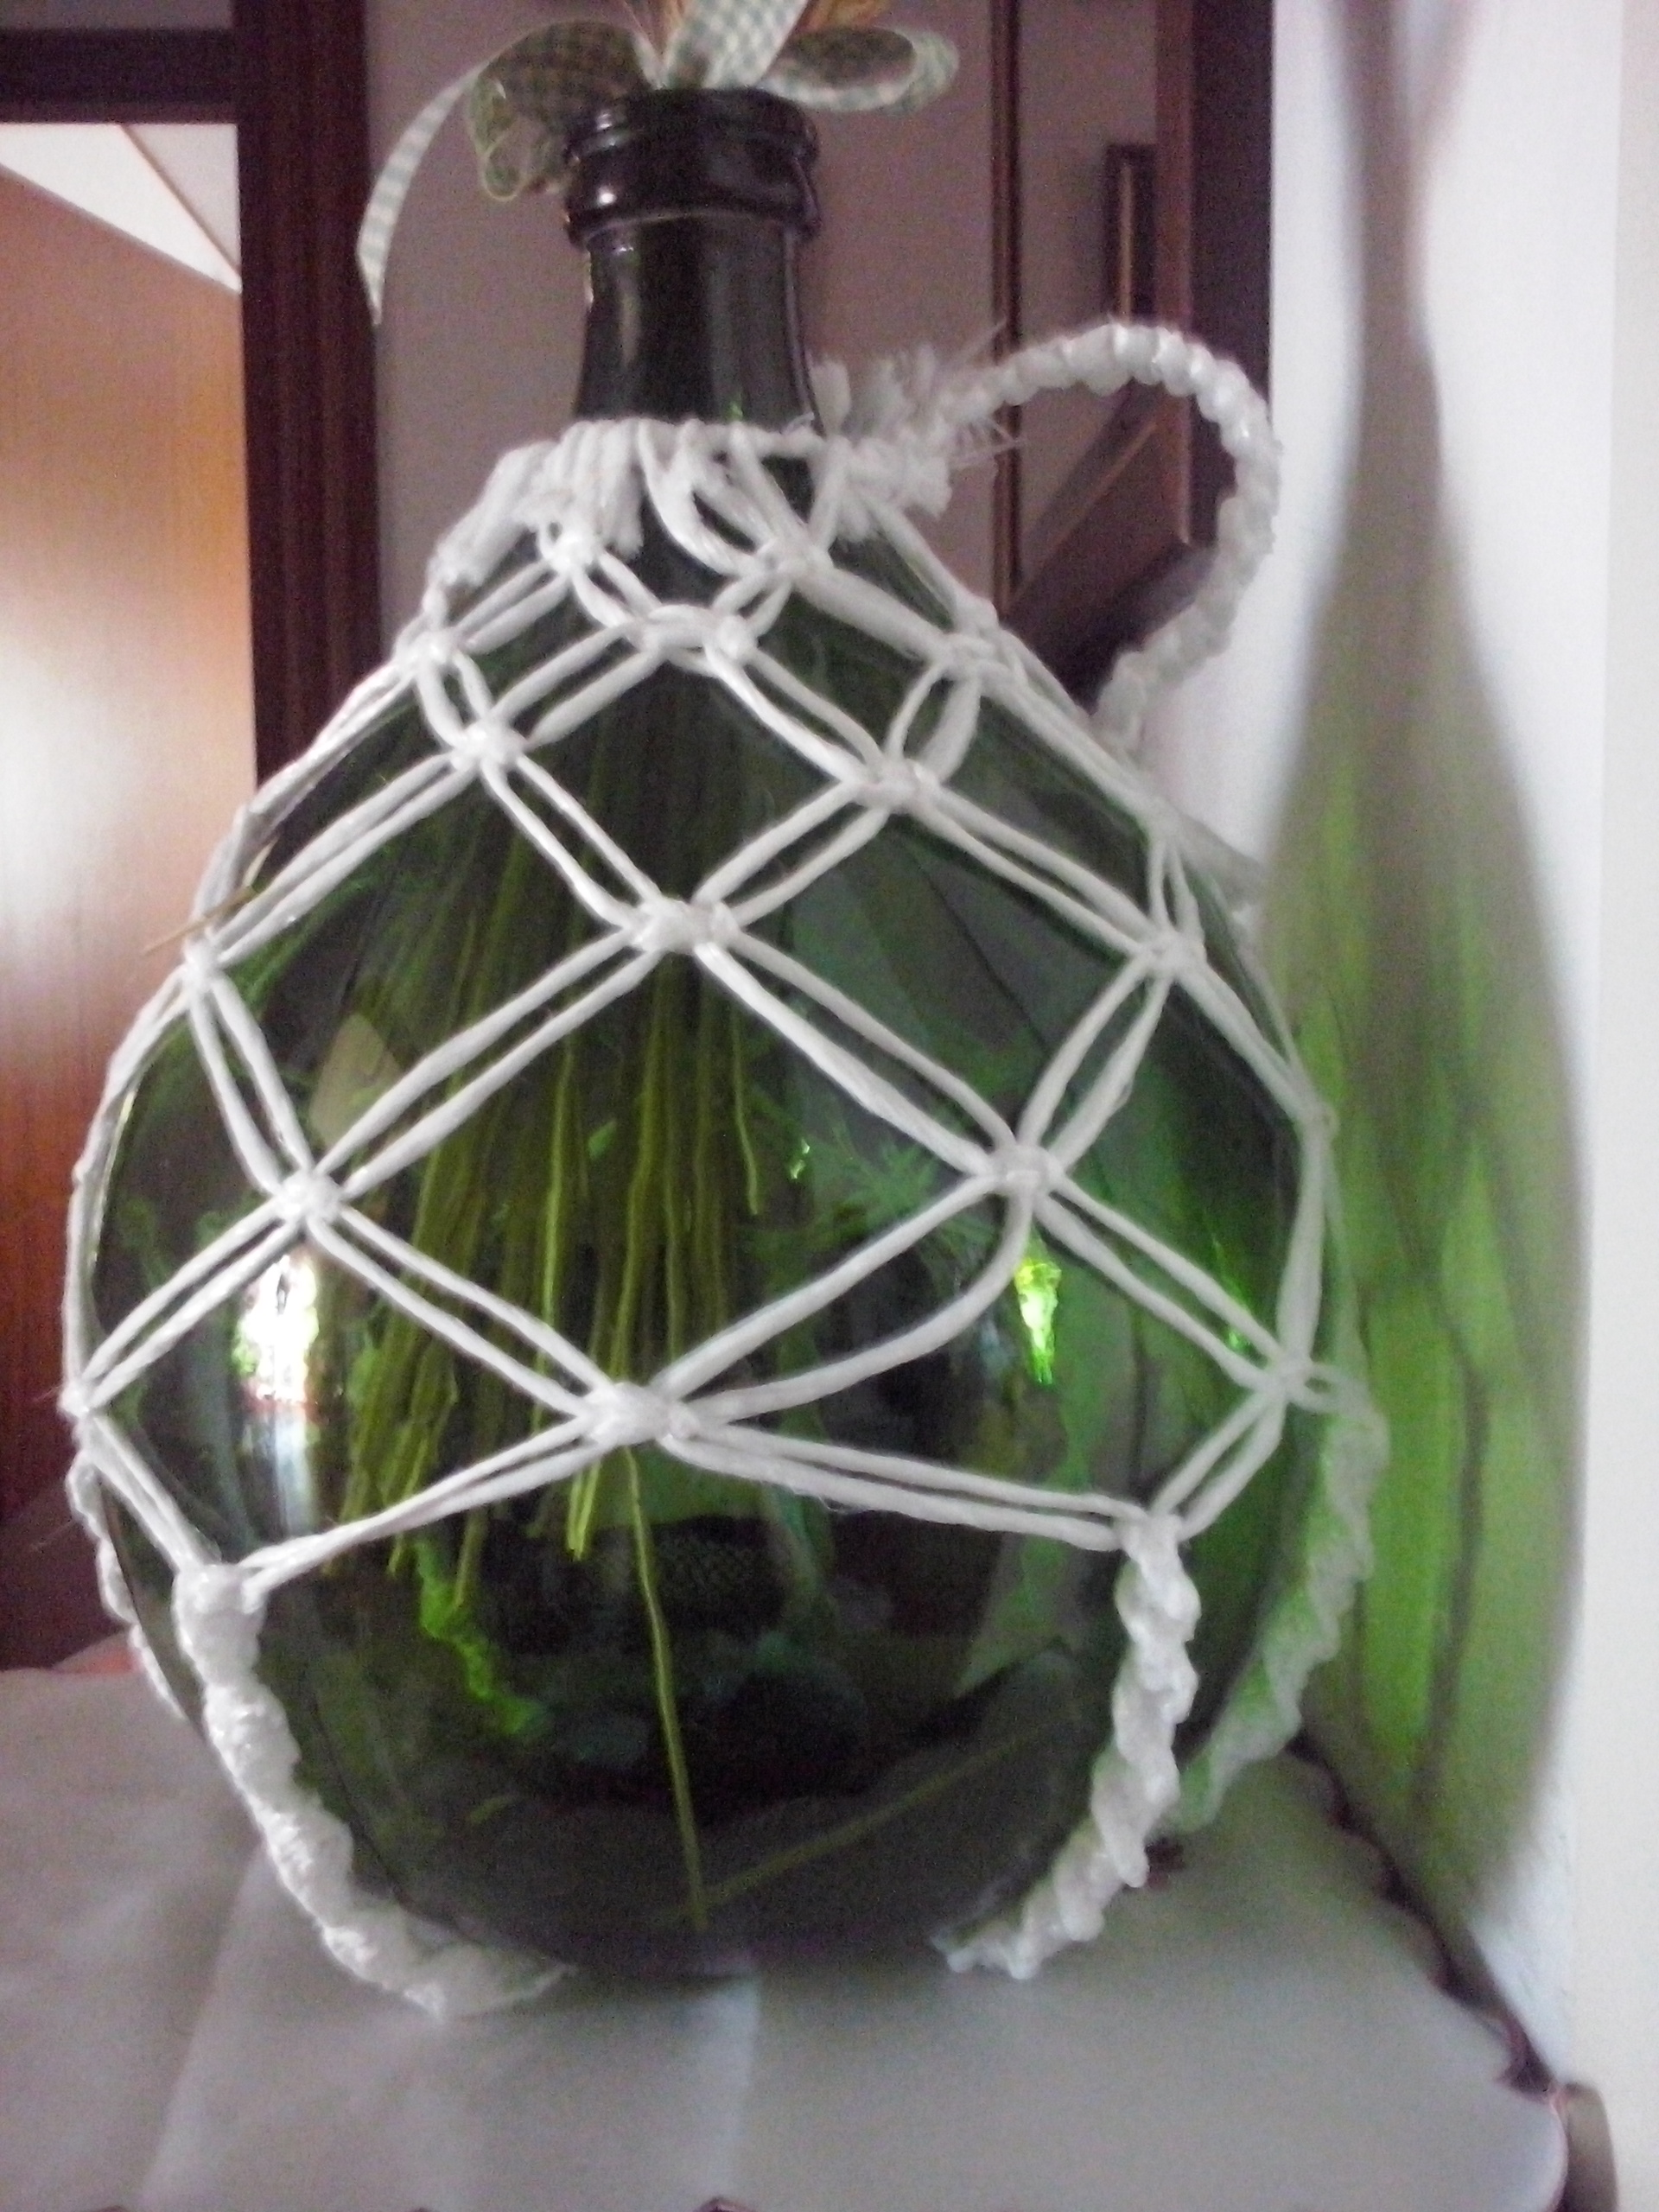 damigiana con rete a macramè